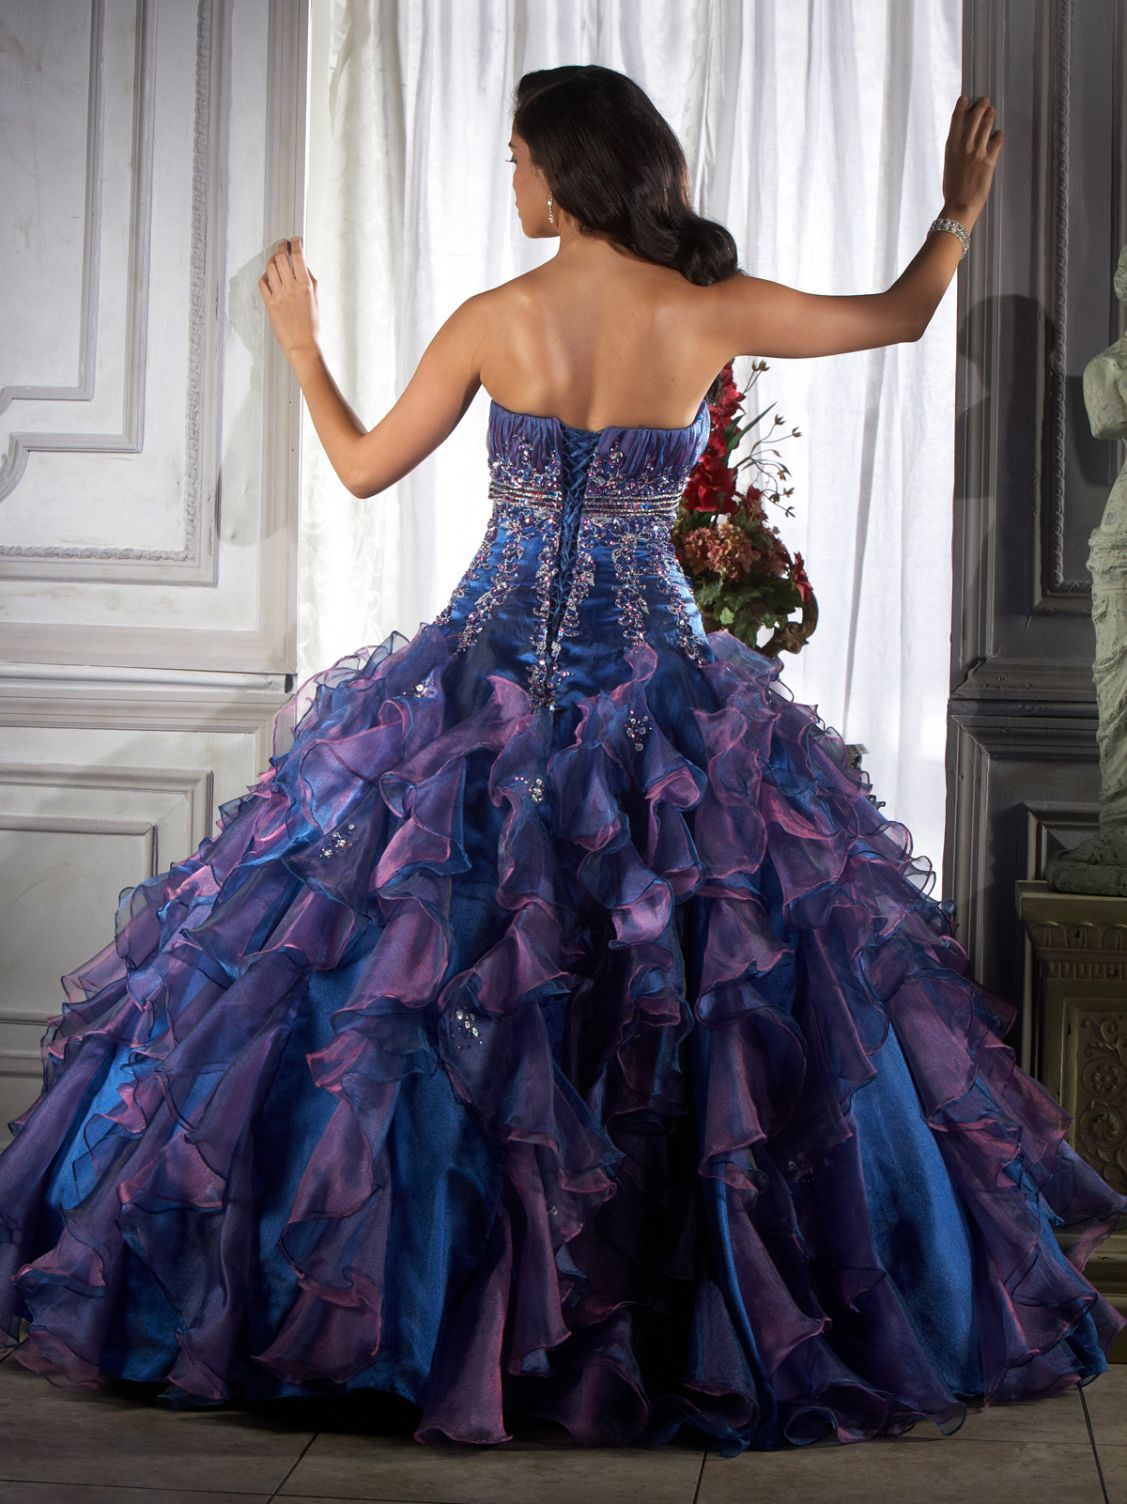 Awesome Purple Wedding Dress Plus Size Check More At Http Svesty Com Purple Wedding Dress Plus Purple Wedding Dress Wedding Dresses Plus Size Wedding Dresses [ 1504 x 1127 Pixel ]